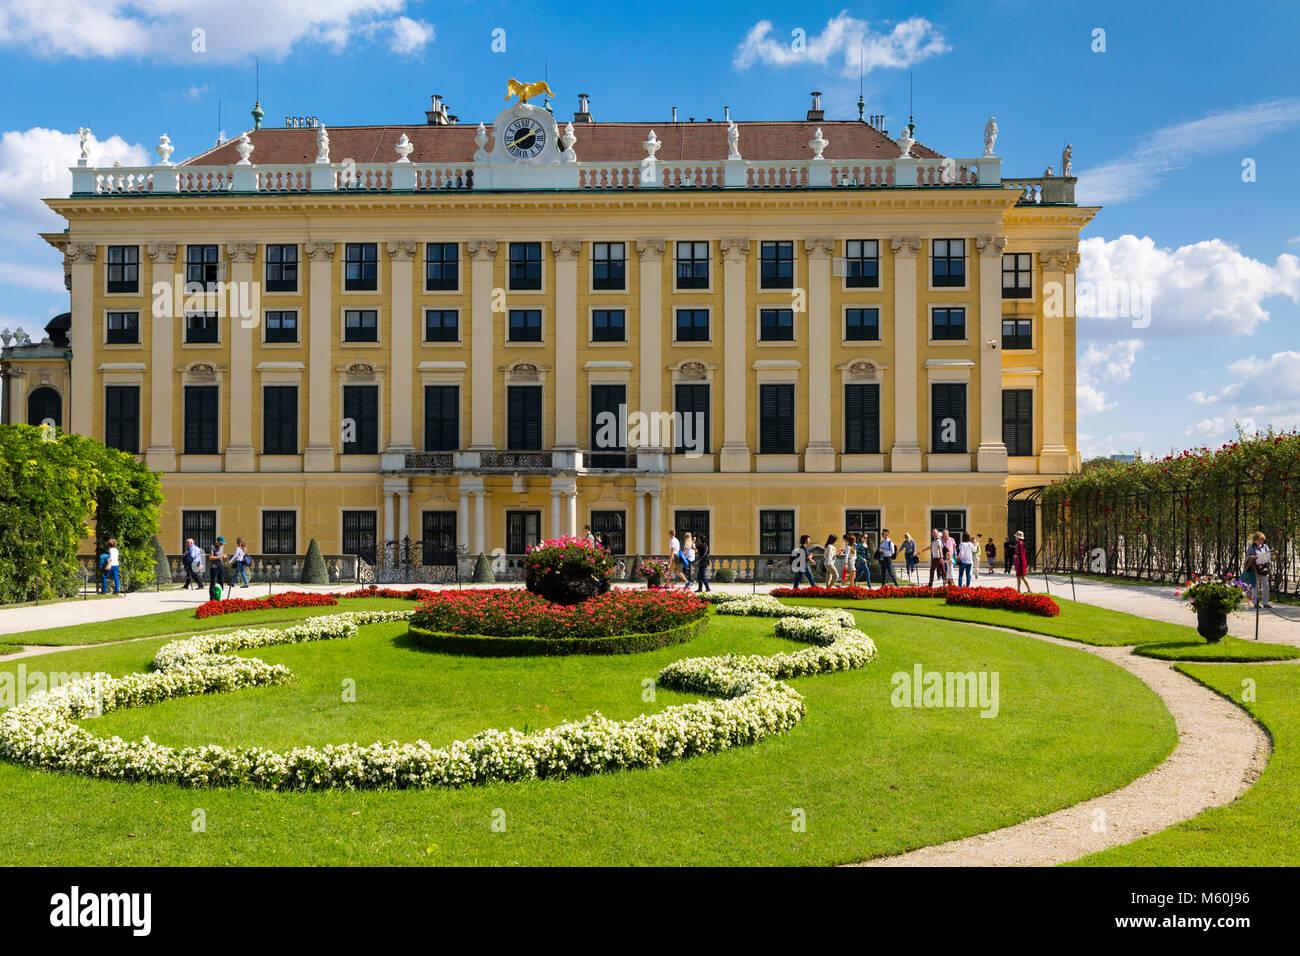 Jardines del Palacio de Schönbrunn, Schonbrunn, Viena, Austria. Imagen De Stock